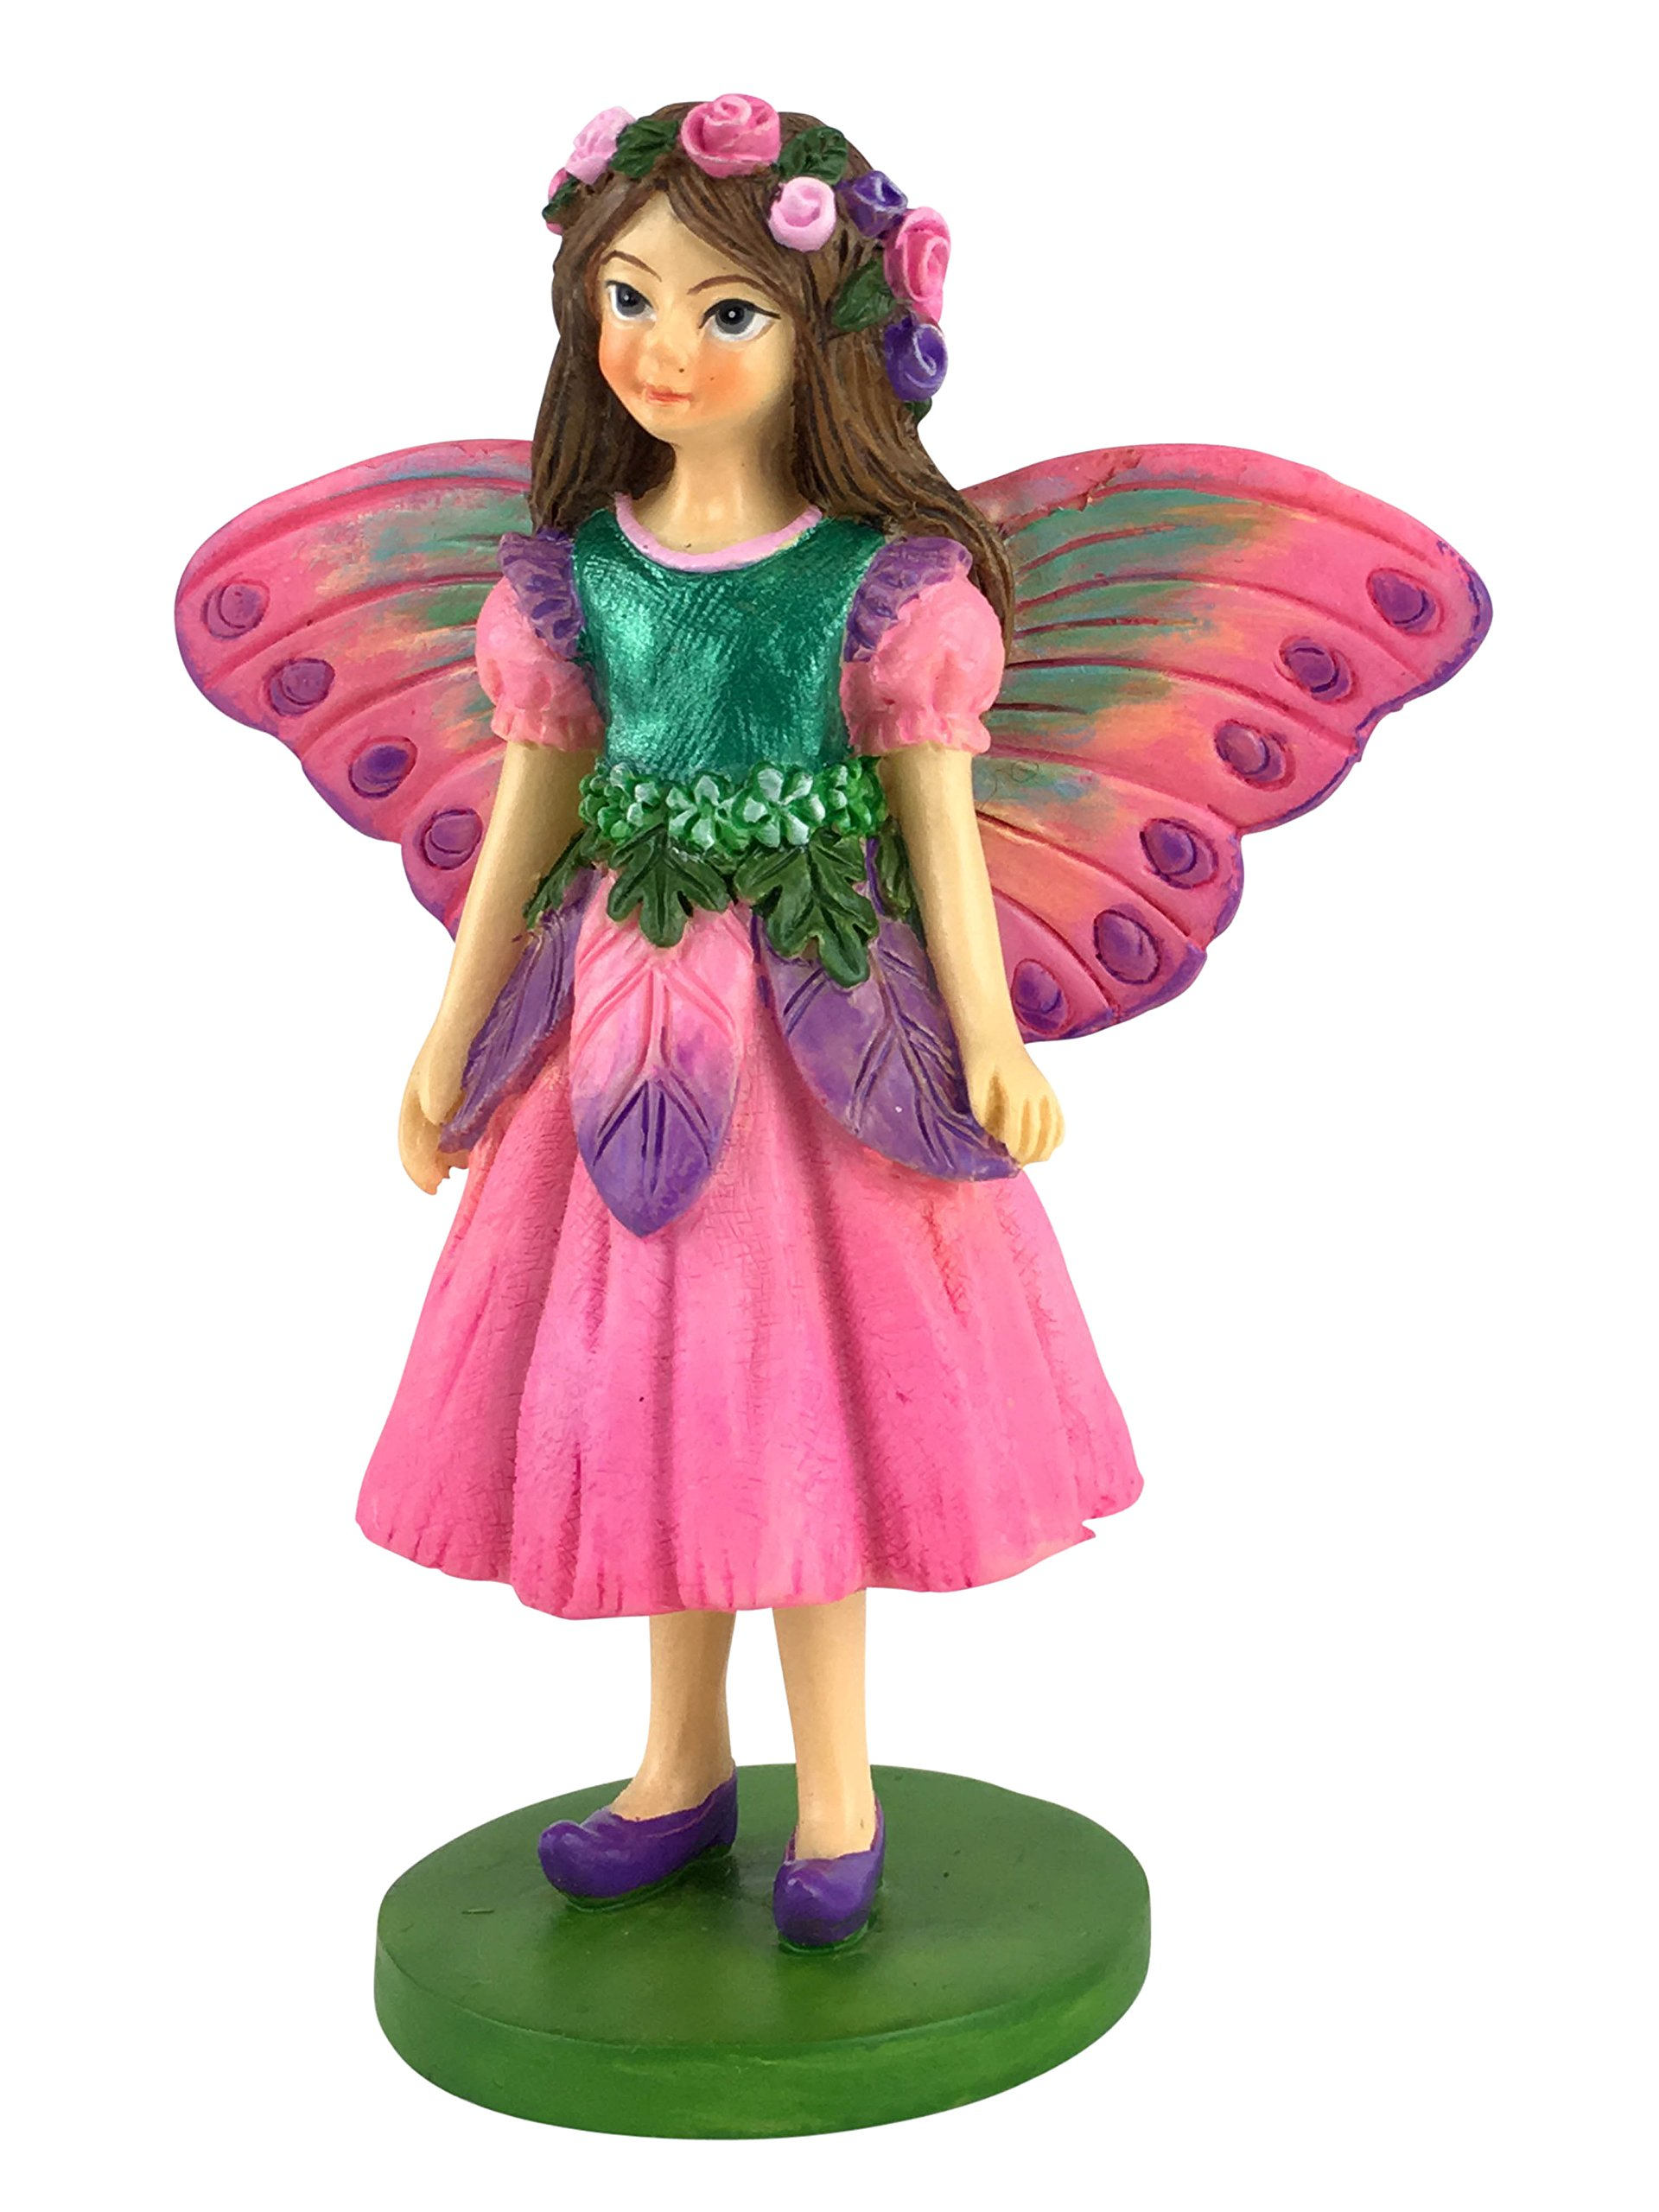 GlitZGlam Sofia The Miniature Fairy Figurine for Your Fairy Garden/Miniature Garden